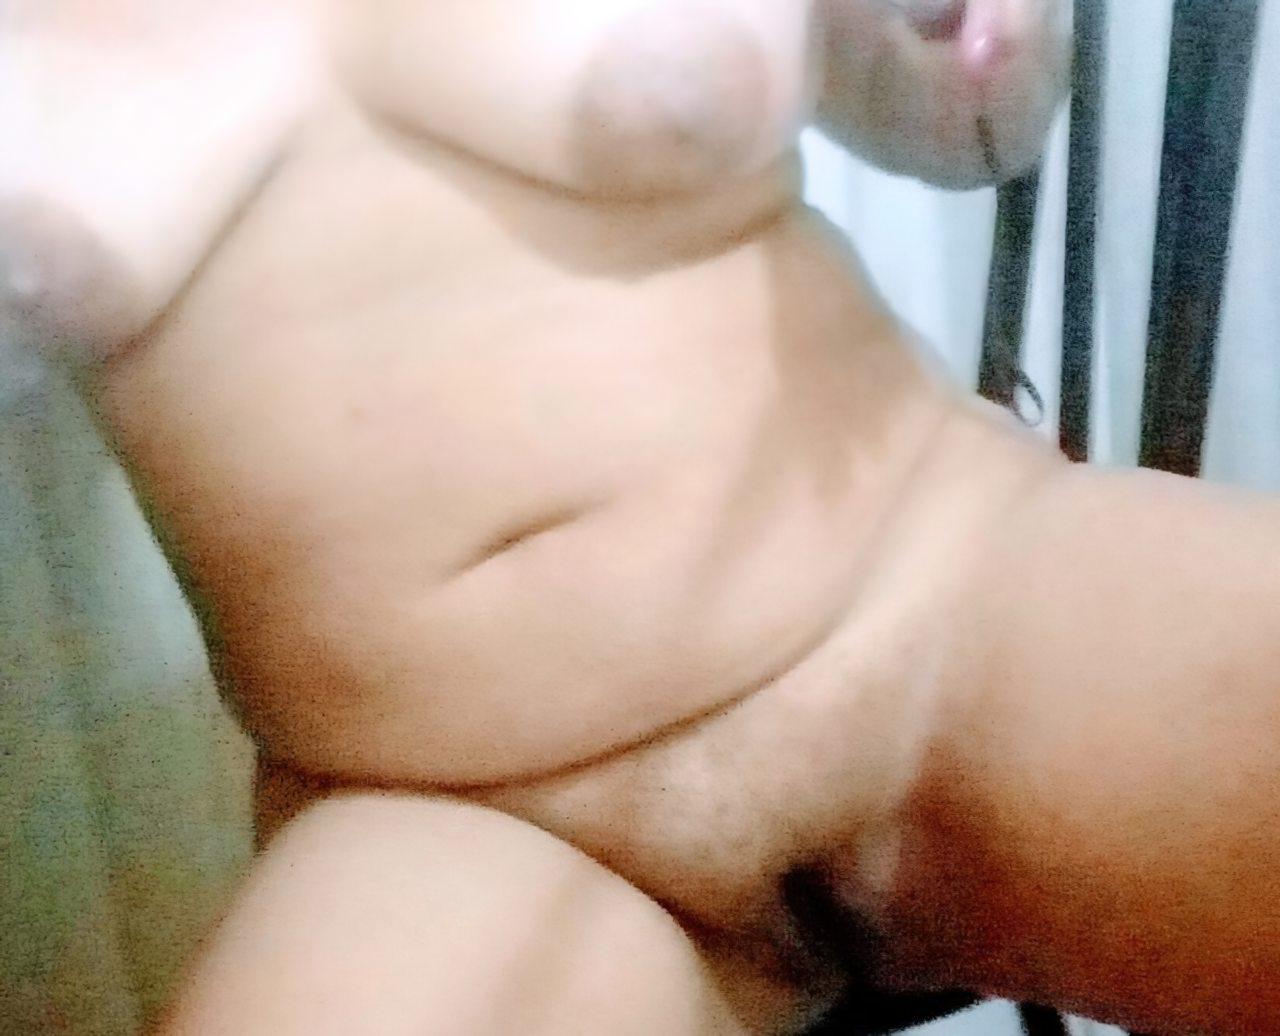 Gostosinha Nua (2)